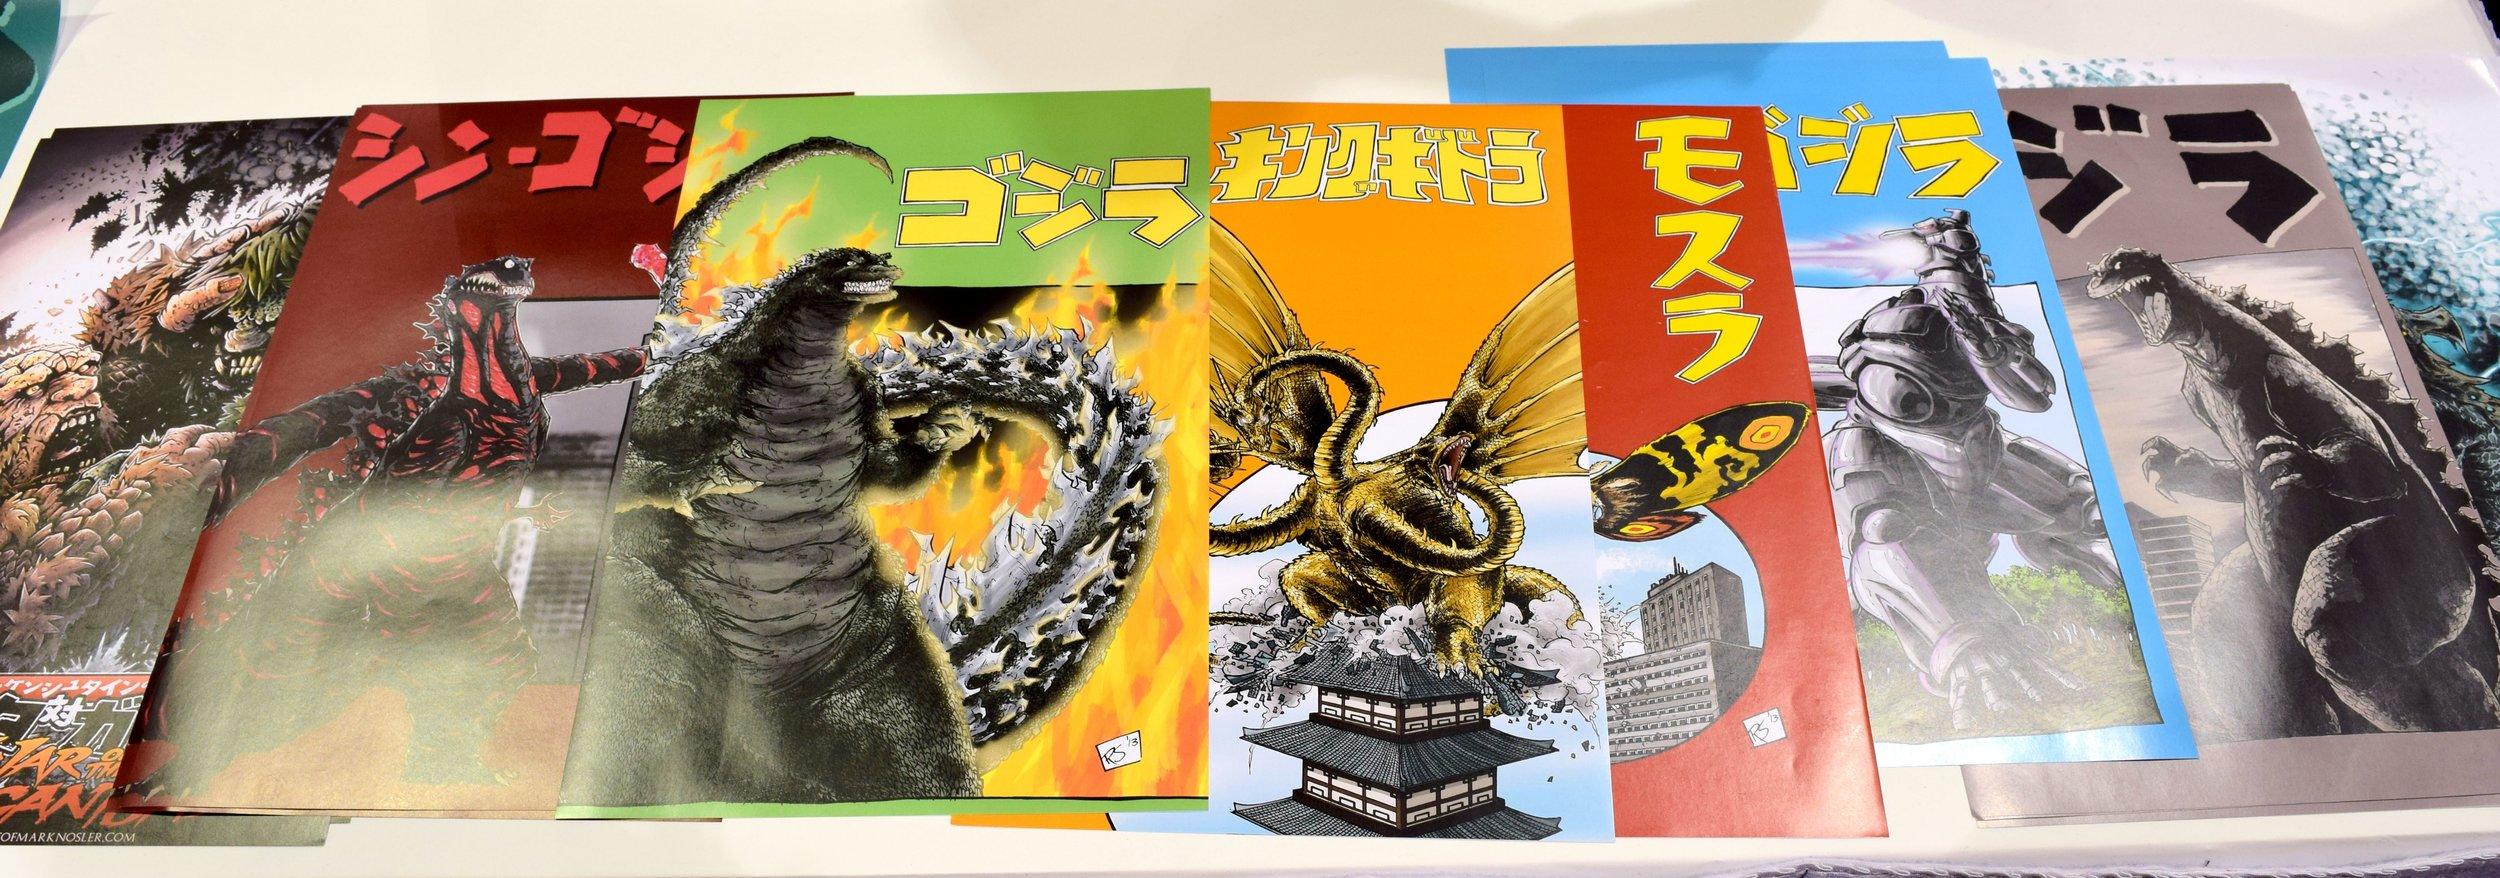 Kaiju posters at the Kodoja table in Phoenix Comic Con 2017.